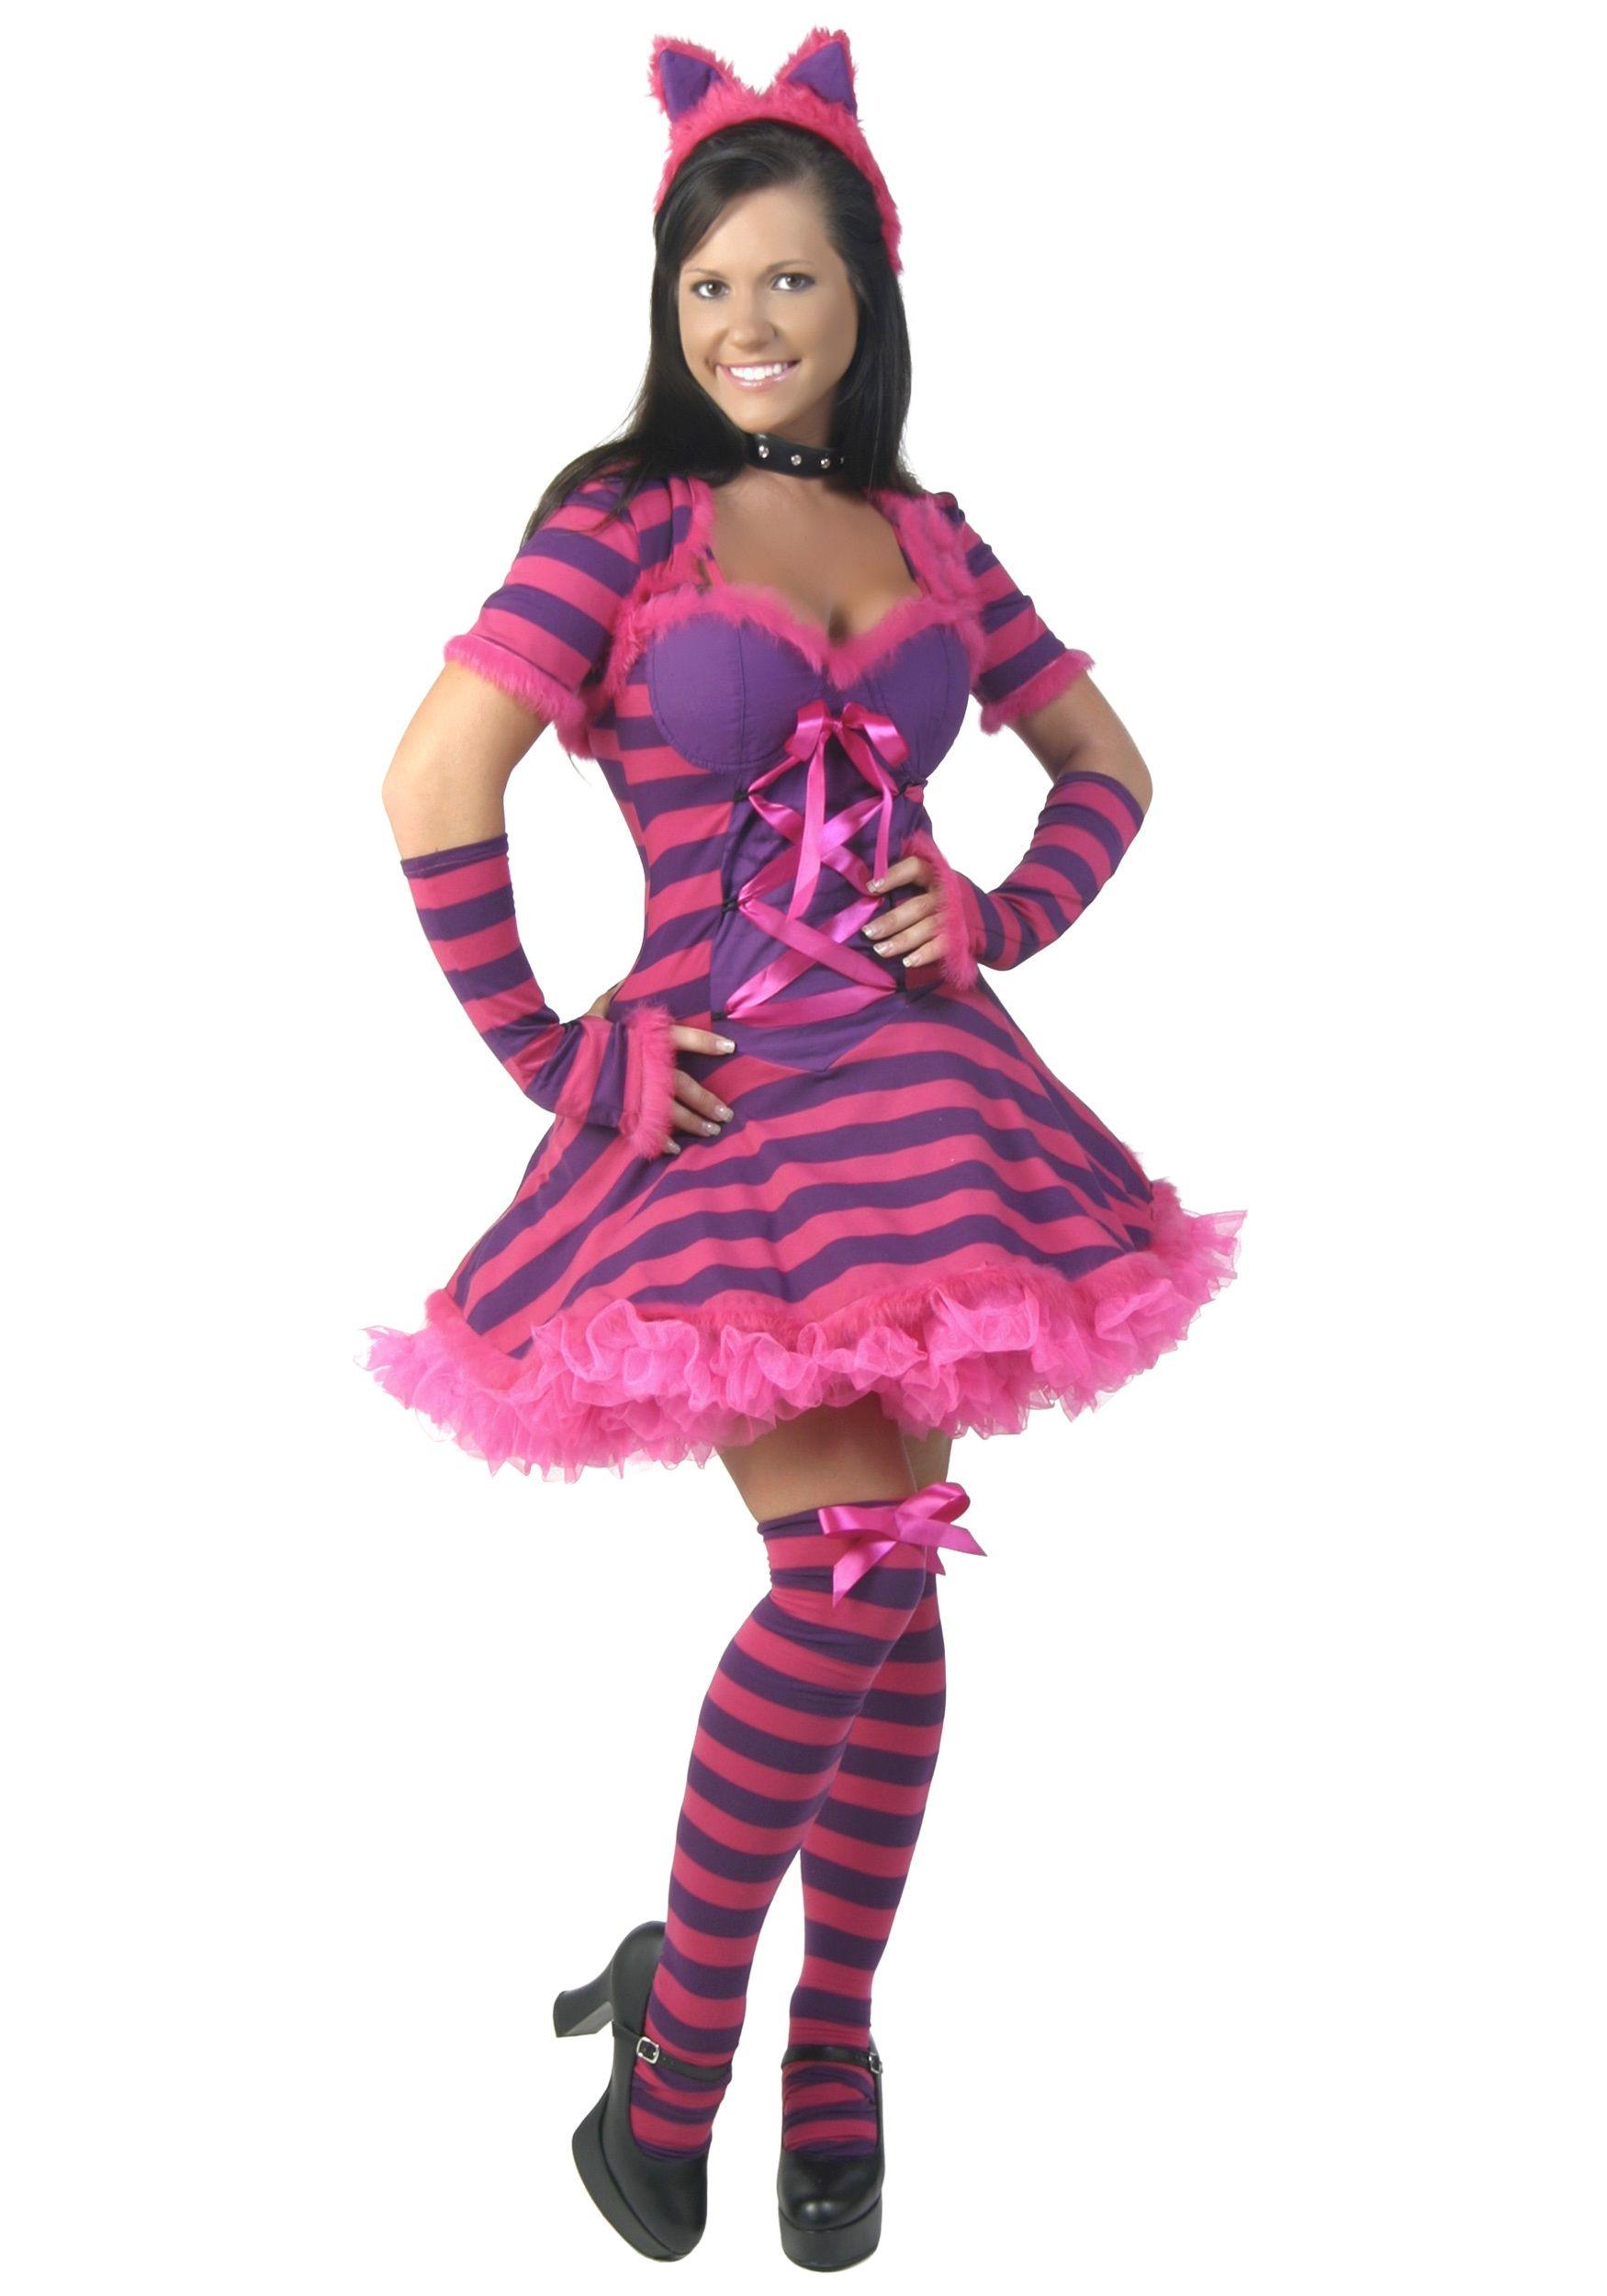 Plus Size Sexy Wonderland Cat Costume | eBay  sc 1 st  Pinterest & Plus Size Sexy Wonderland Cat Costume | Pinterest | Halloween ...